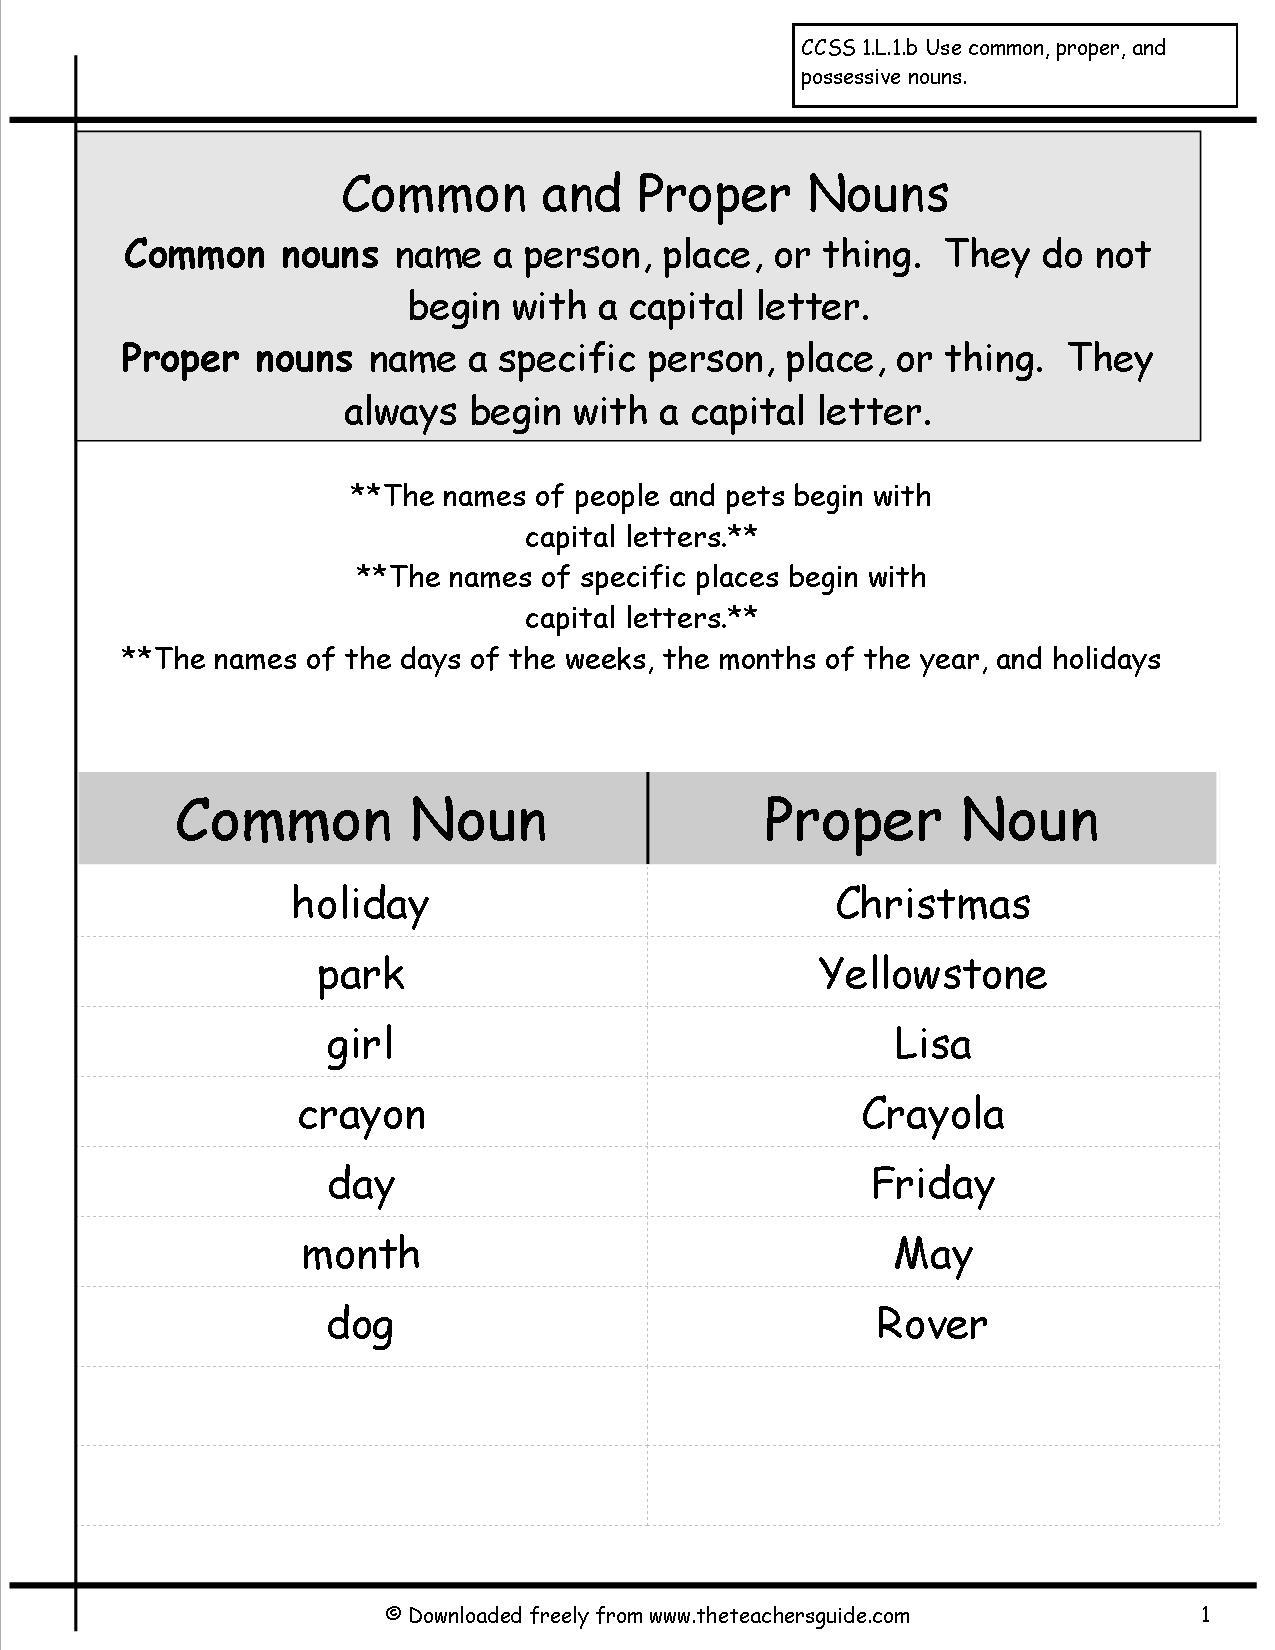 18 Best Images Of Common And Proper Noun Sort Worksheet